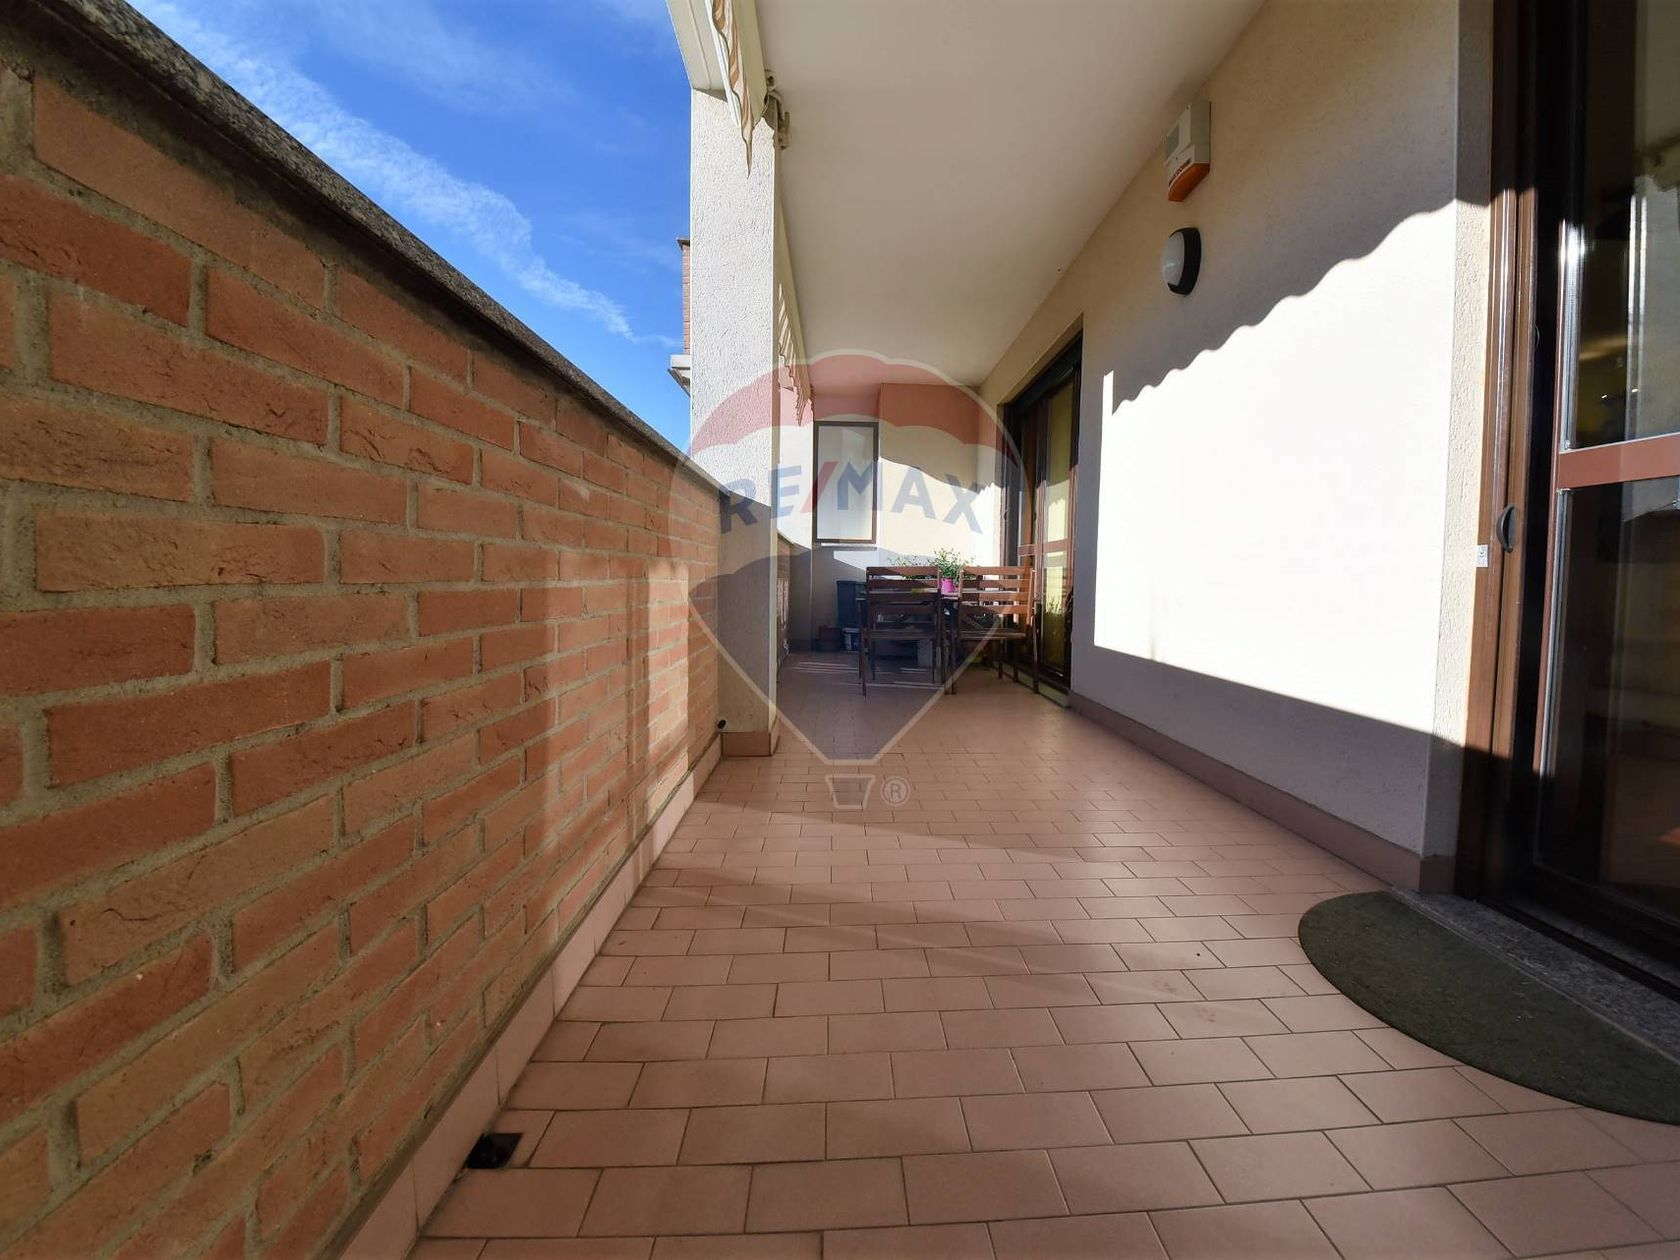 Appartamento Cascina ferrara, Saronno, VA Vendita - Foto 7